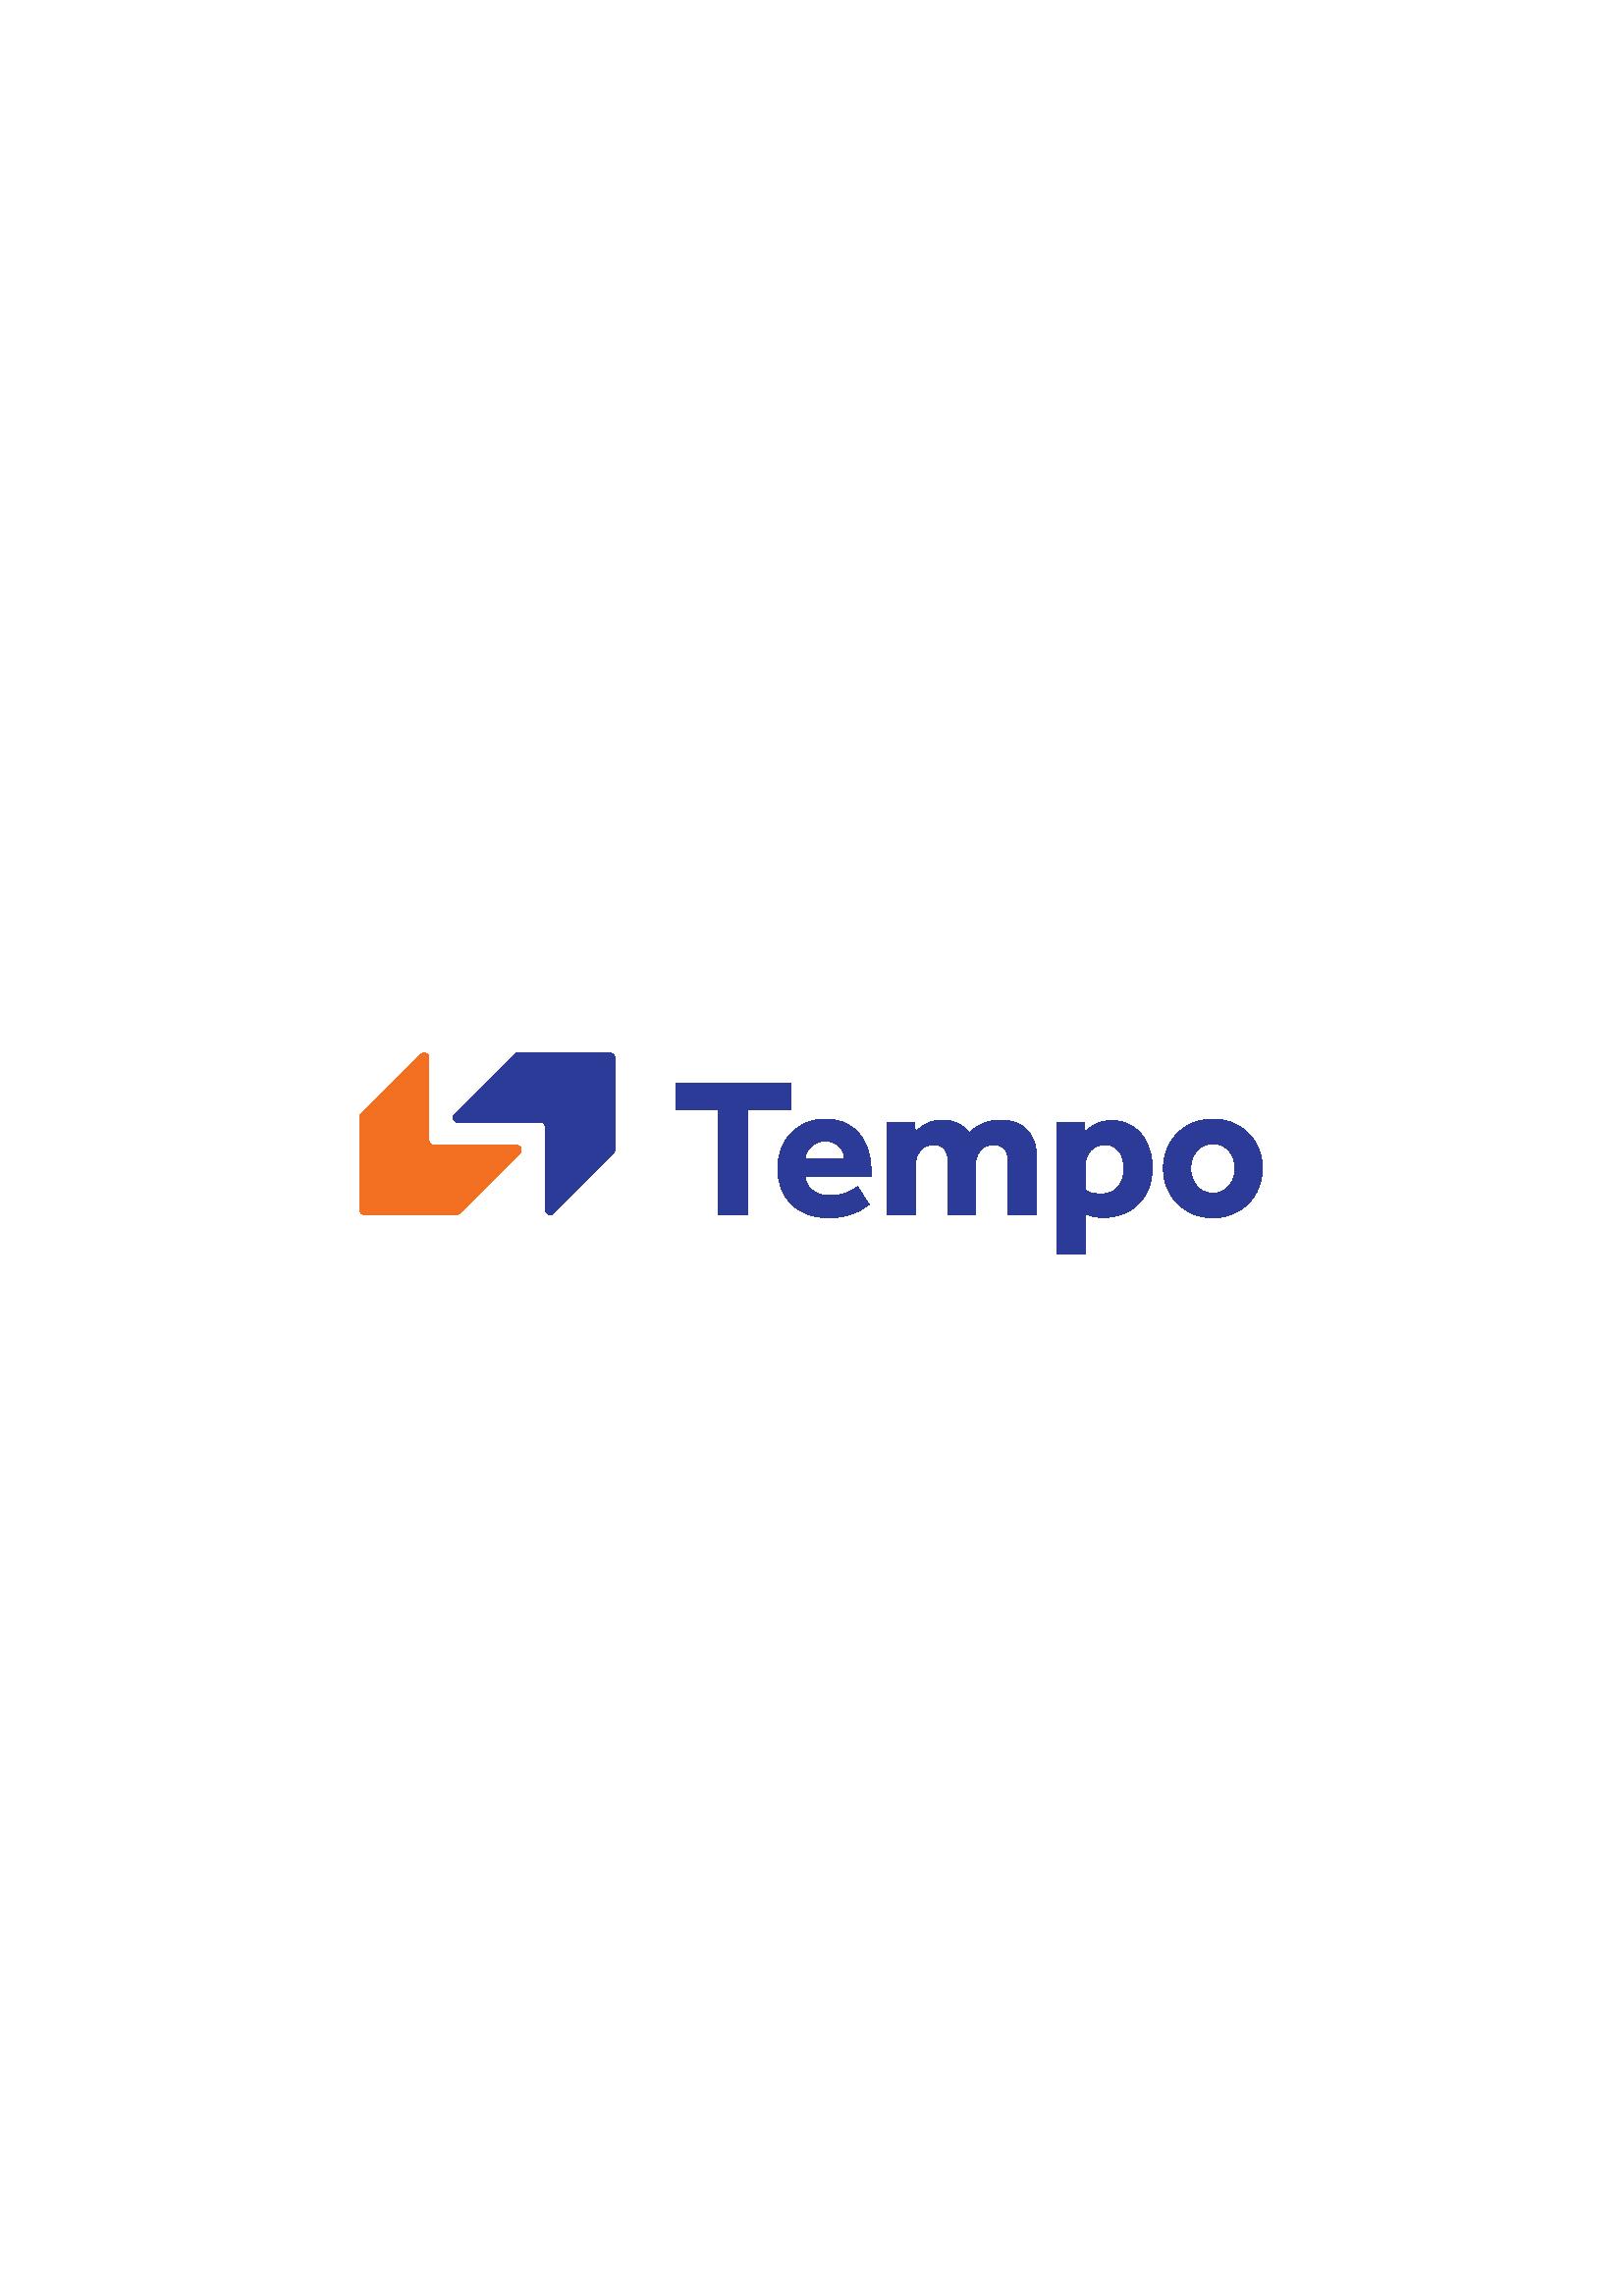 tempo-1-1024x717